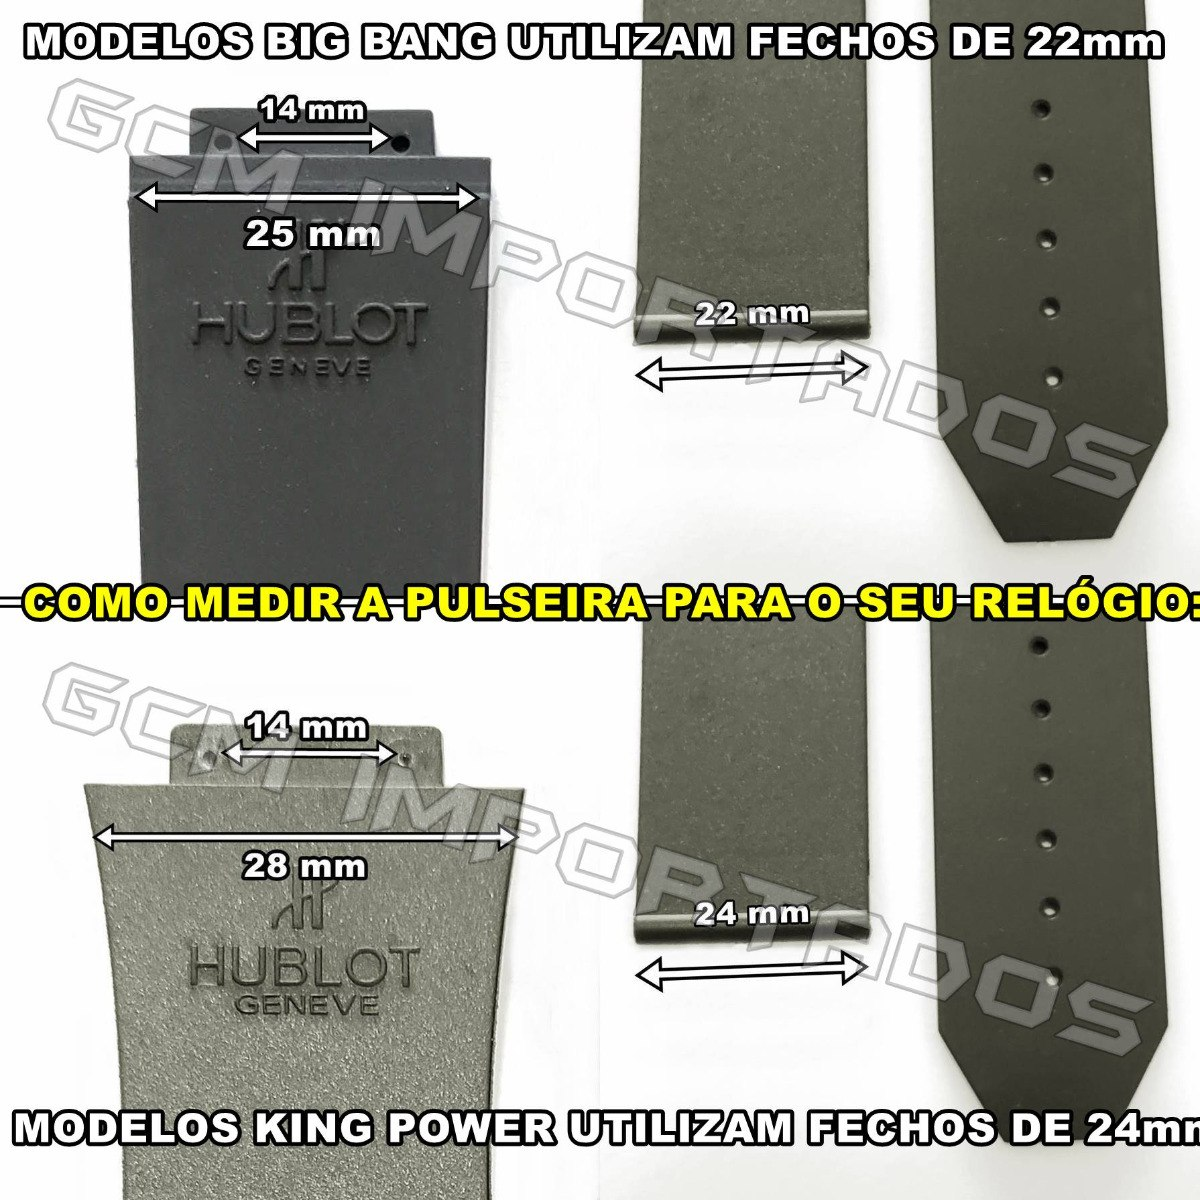 3c9d3c8300b Pulseira Hublot King Power F1 Ayrton Senna Costura Verde - R  69